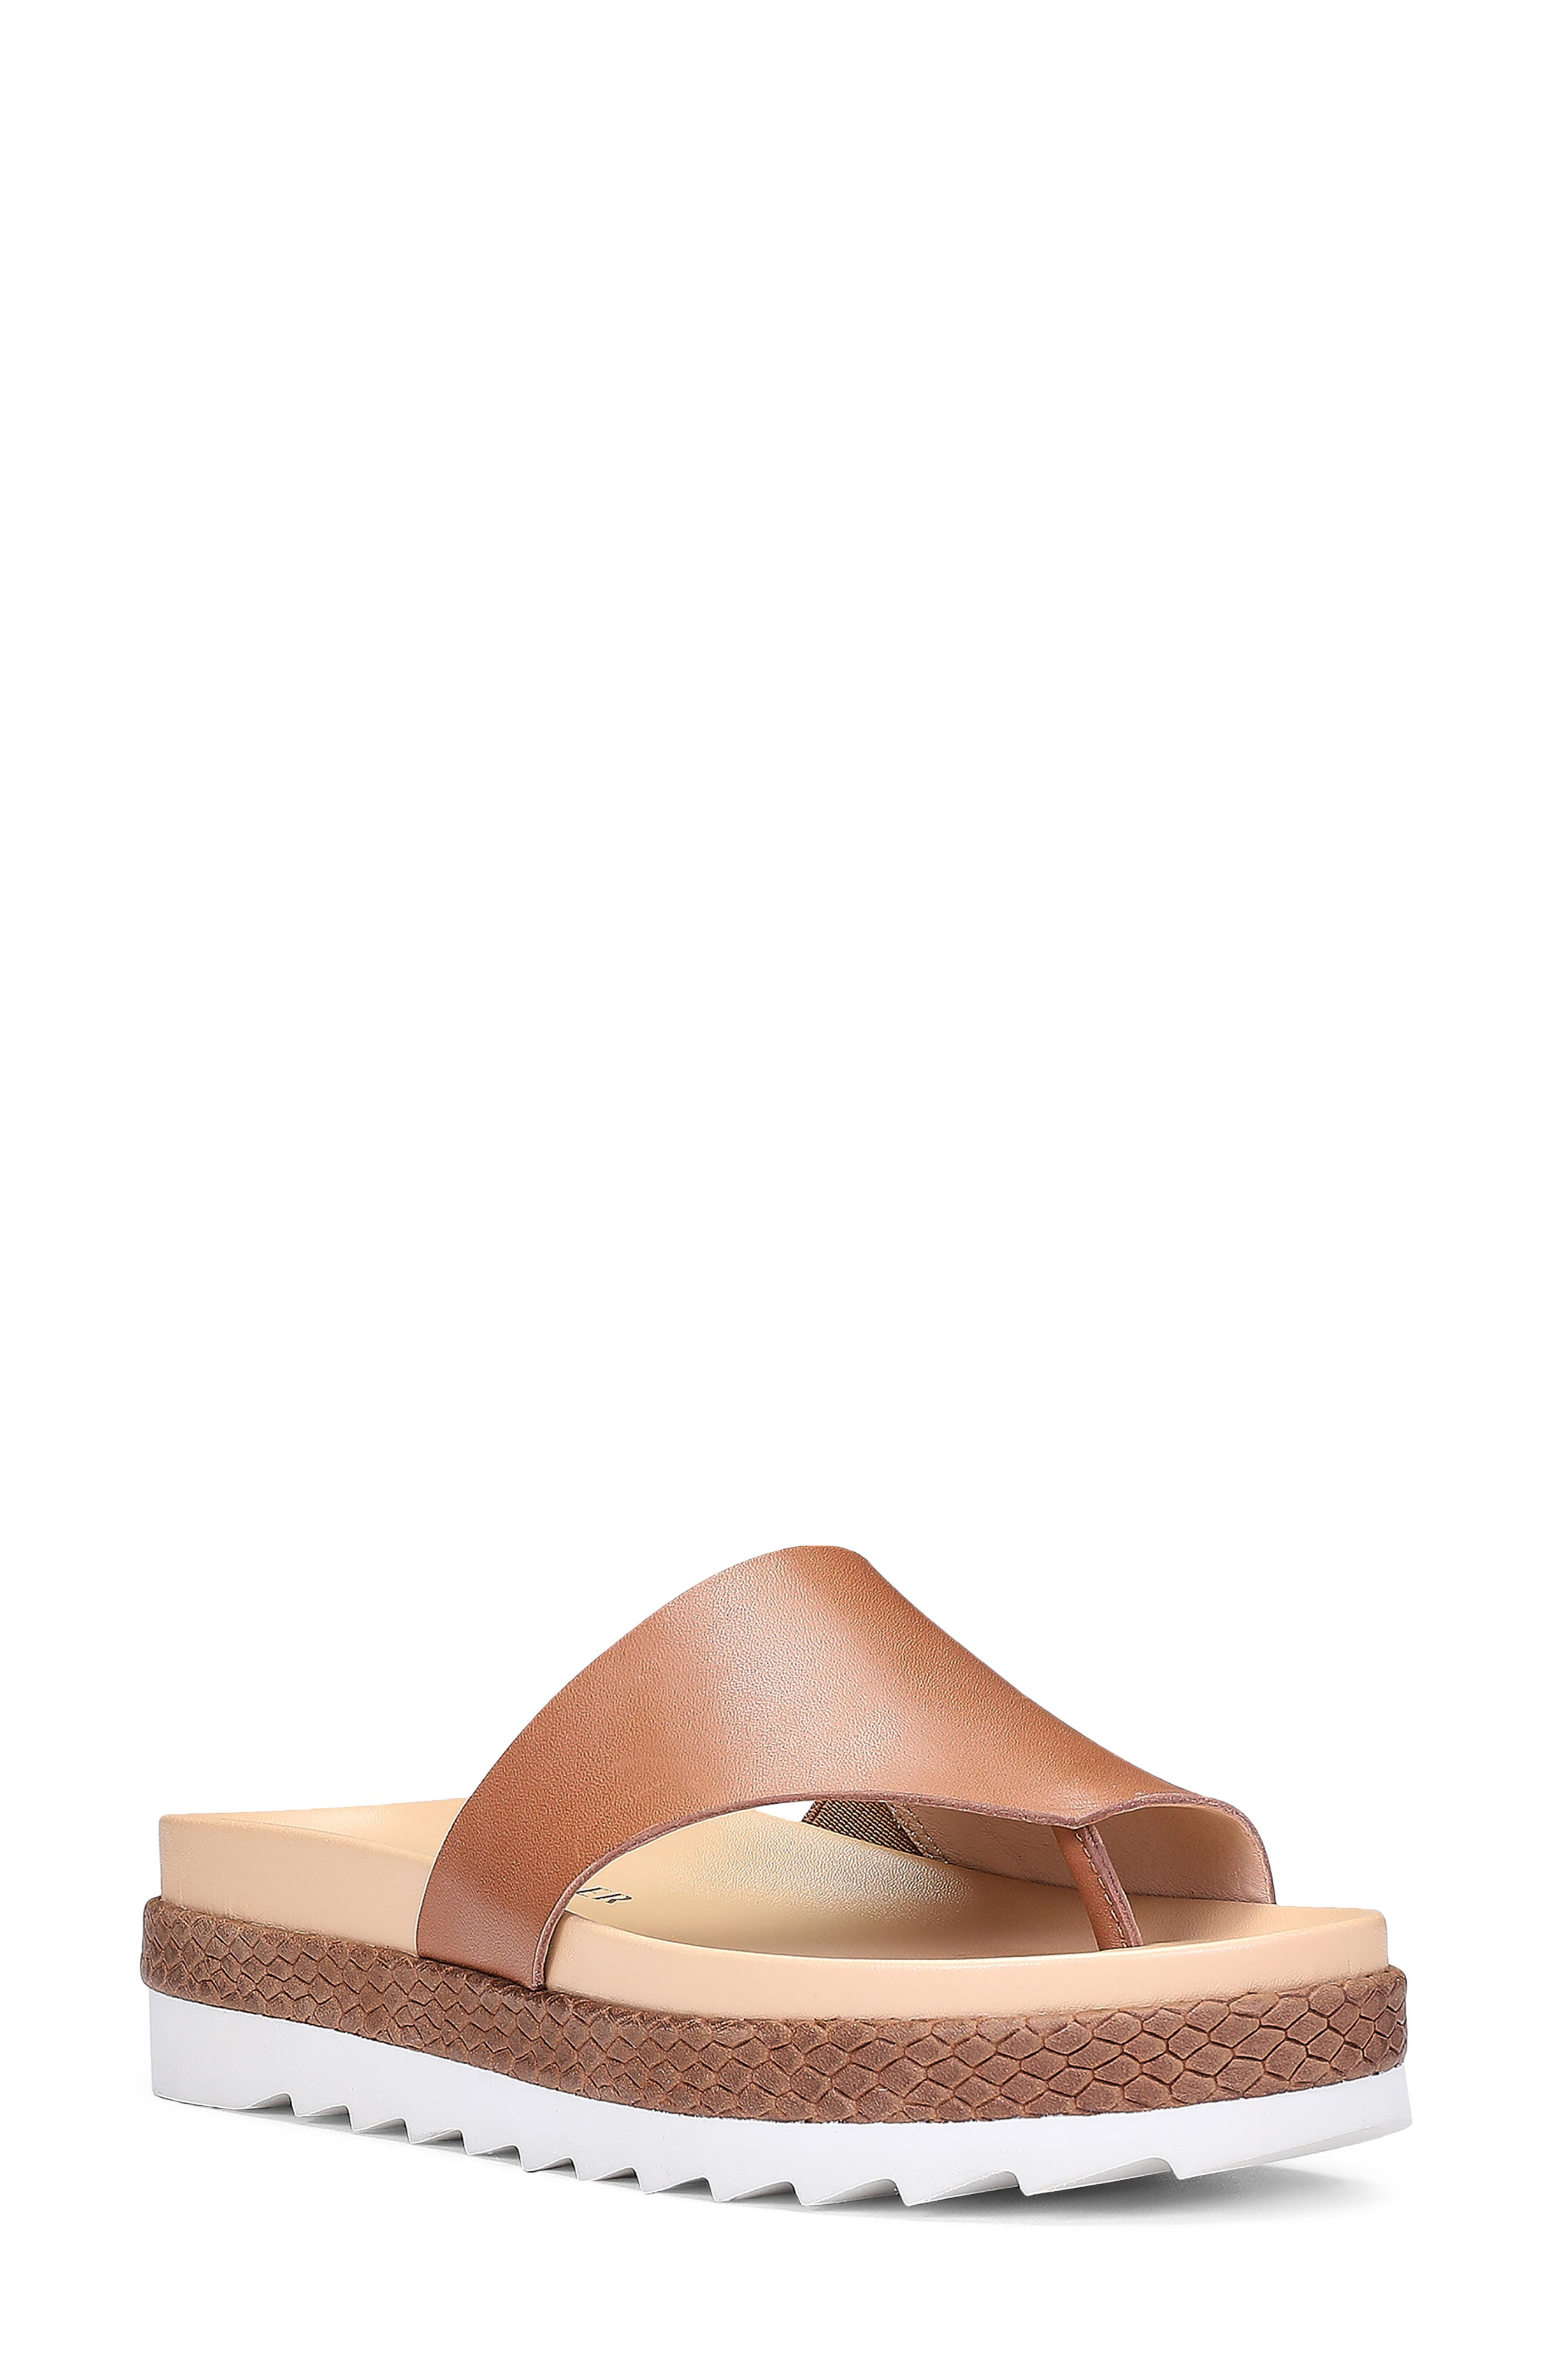 Lylaa Slide Sandal